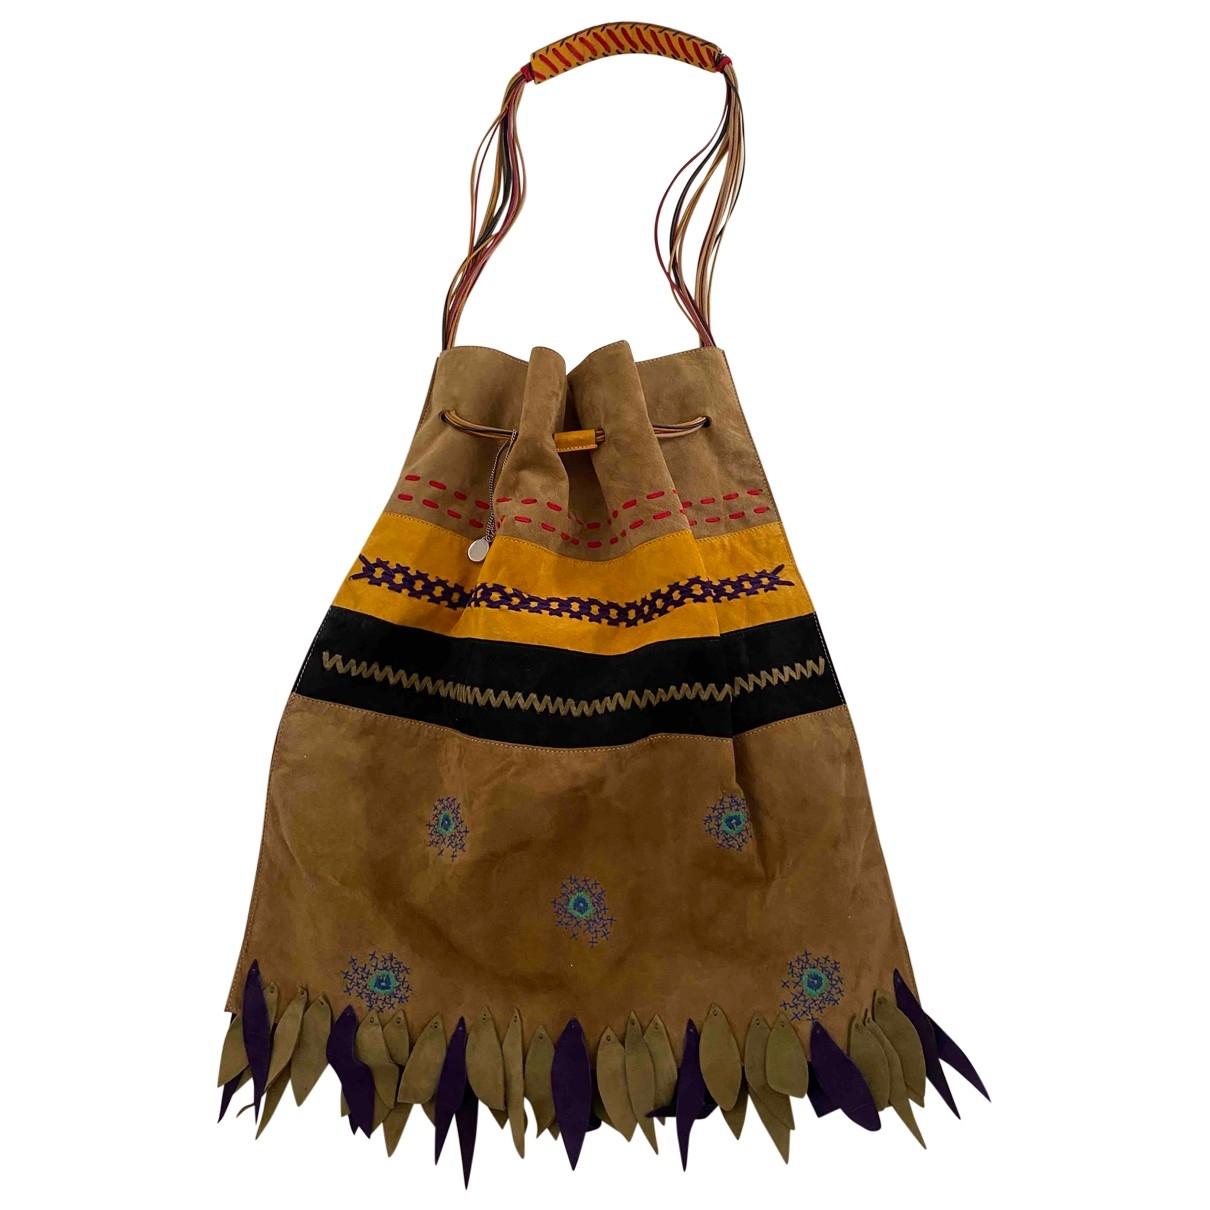 Trussardi \N Camel Suede handbag for Women \N